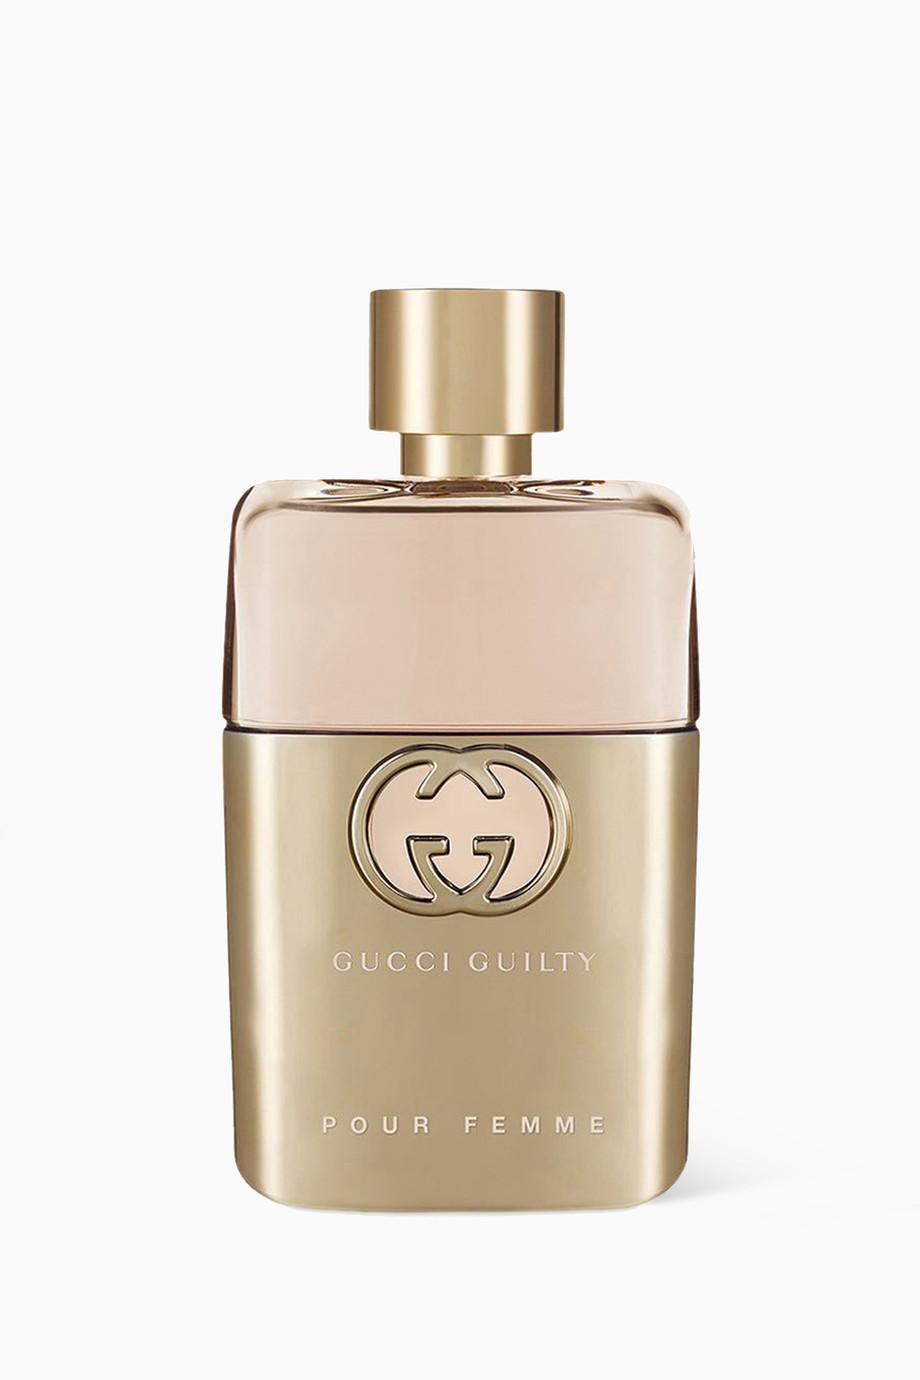 42bace248 تسوق ماء عطر جيلتي للنساء، 50 مل Gucci Perfumes ملون للنساء | اُناس ...